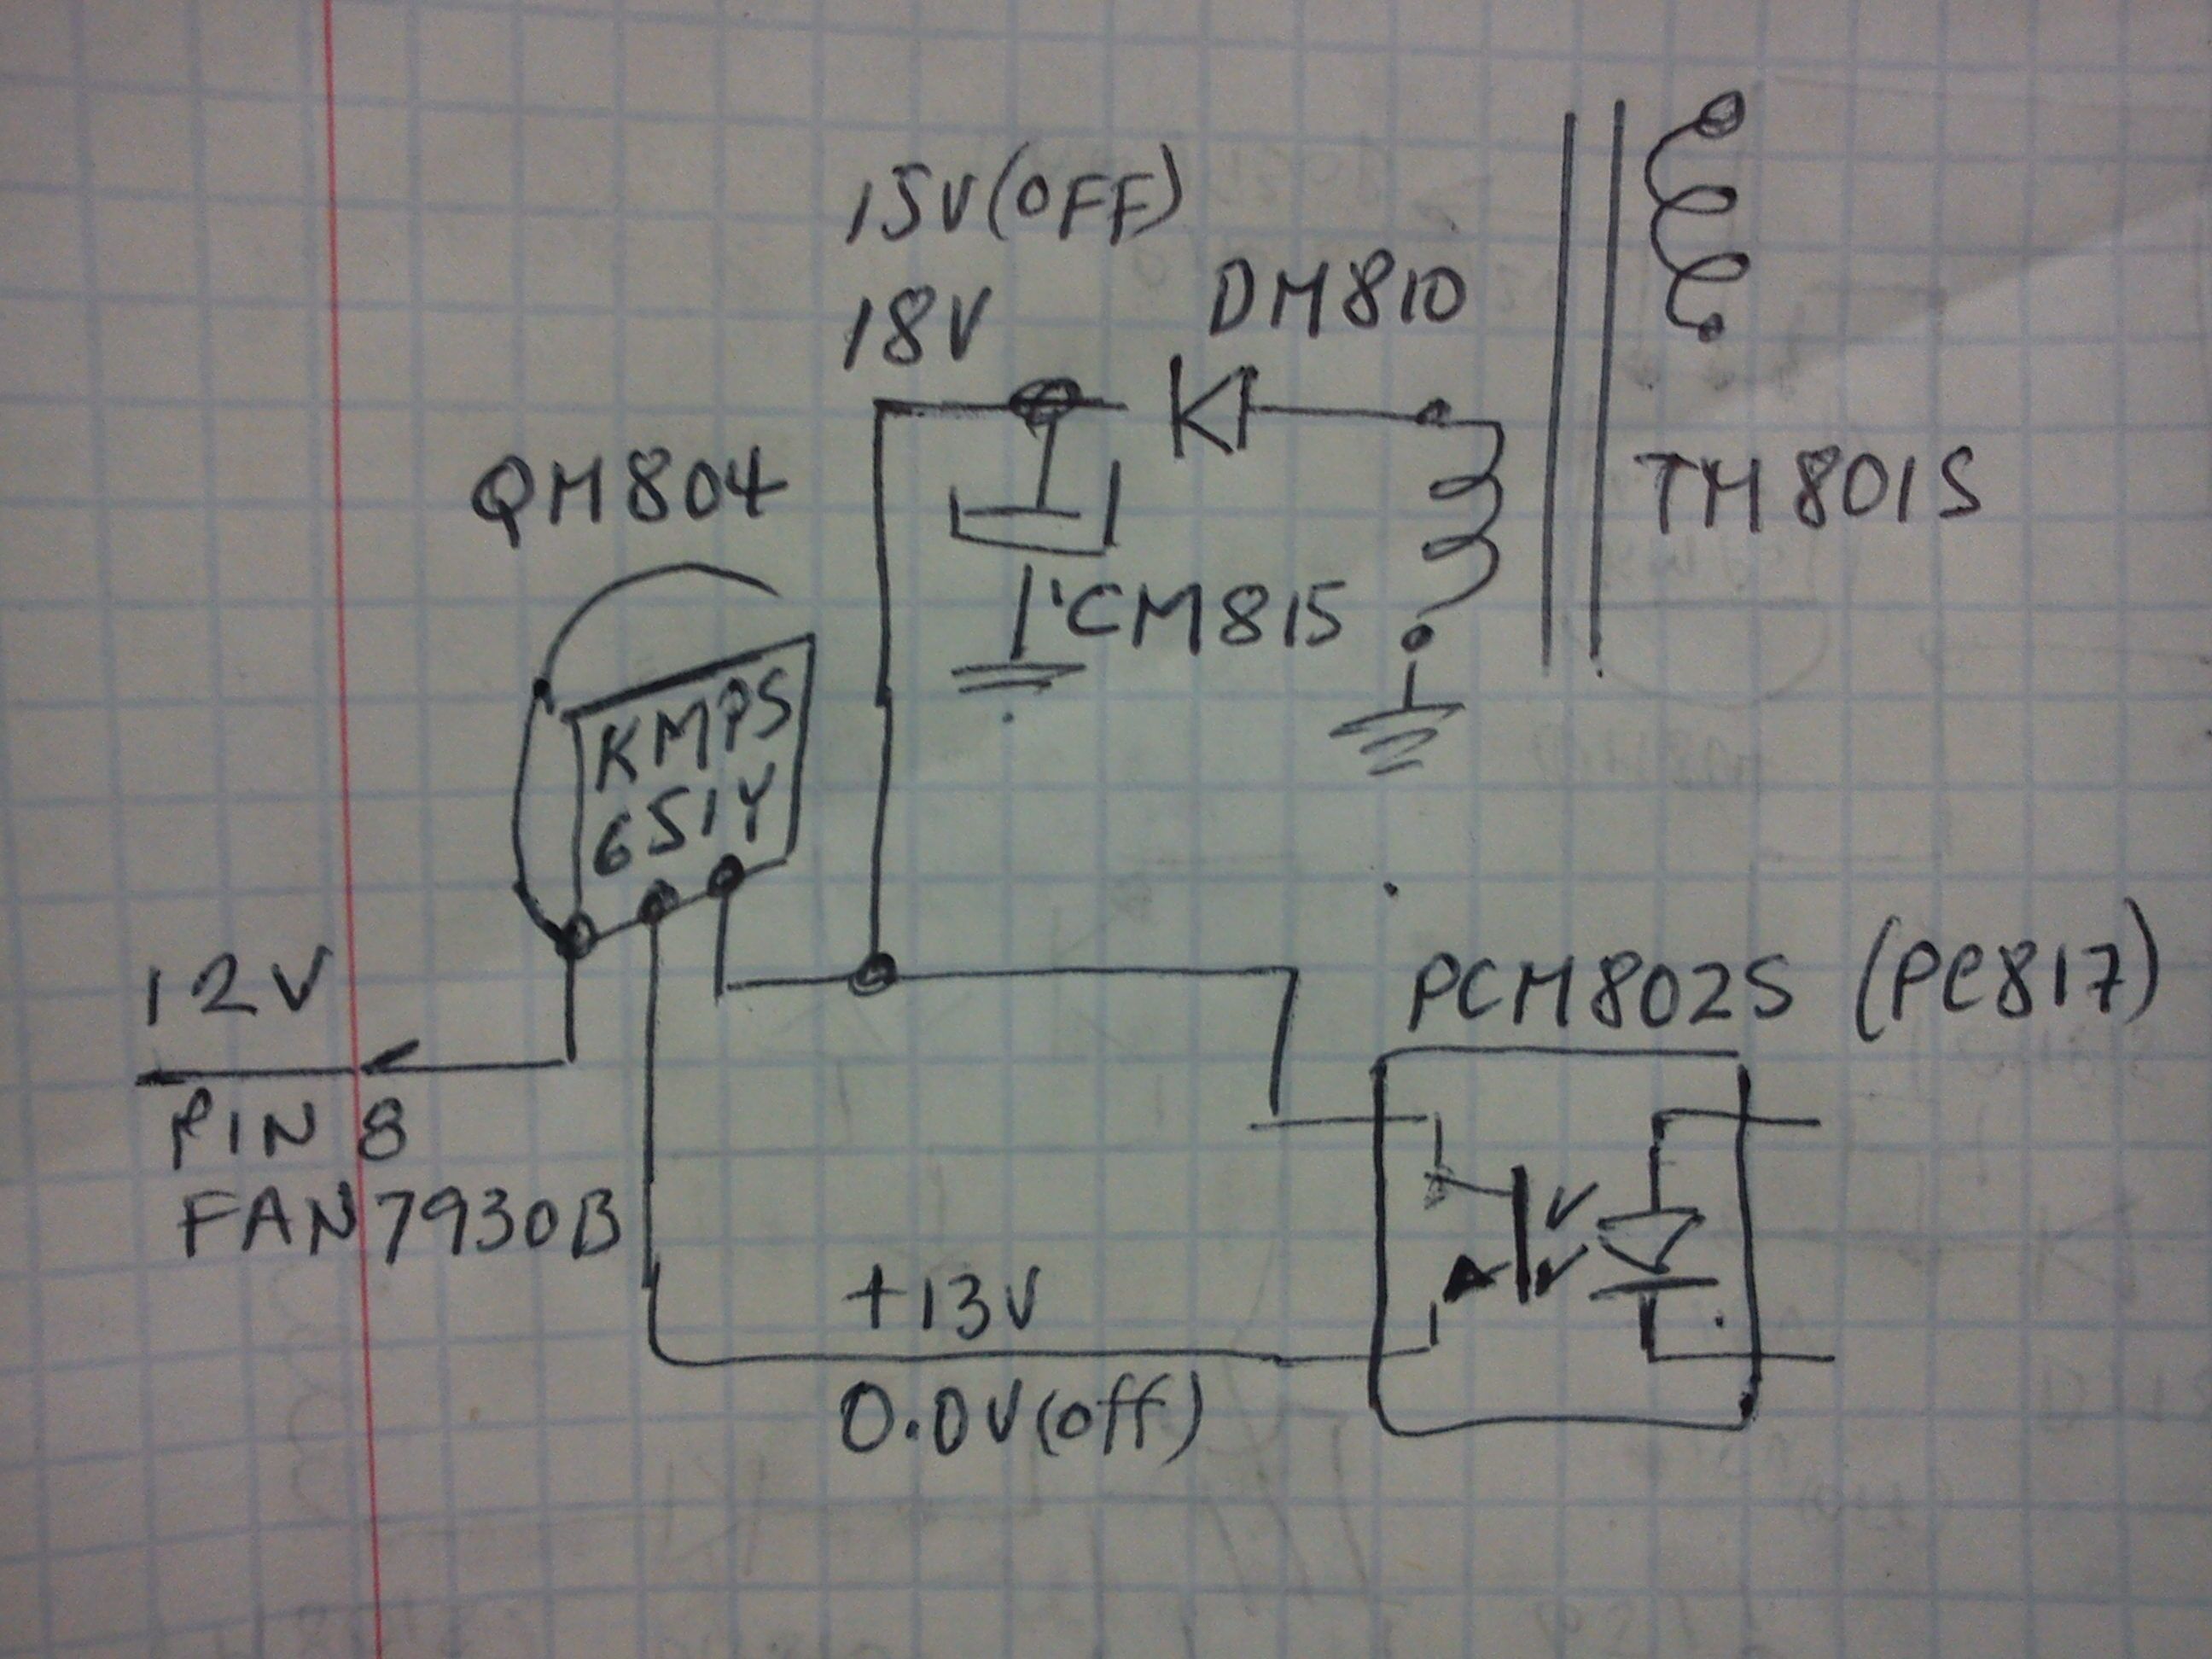 LCD LED LG 47LW980S - Nie dzia�a, zadymi�o si� z wn�trza.